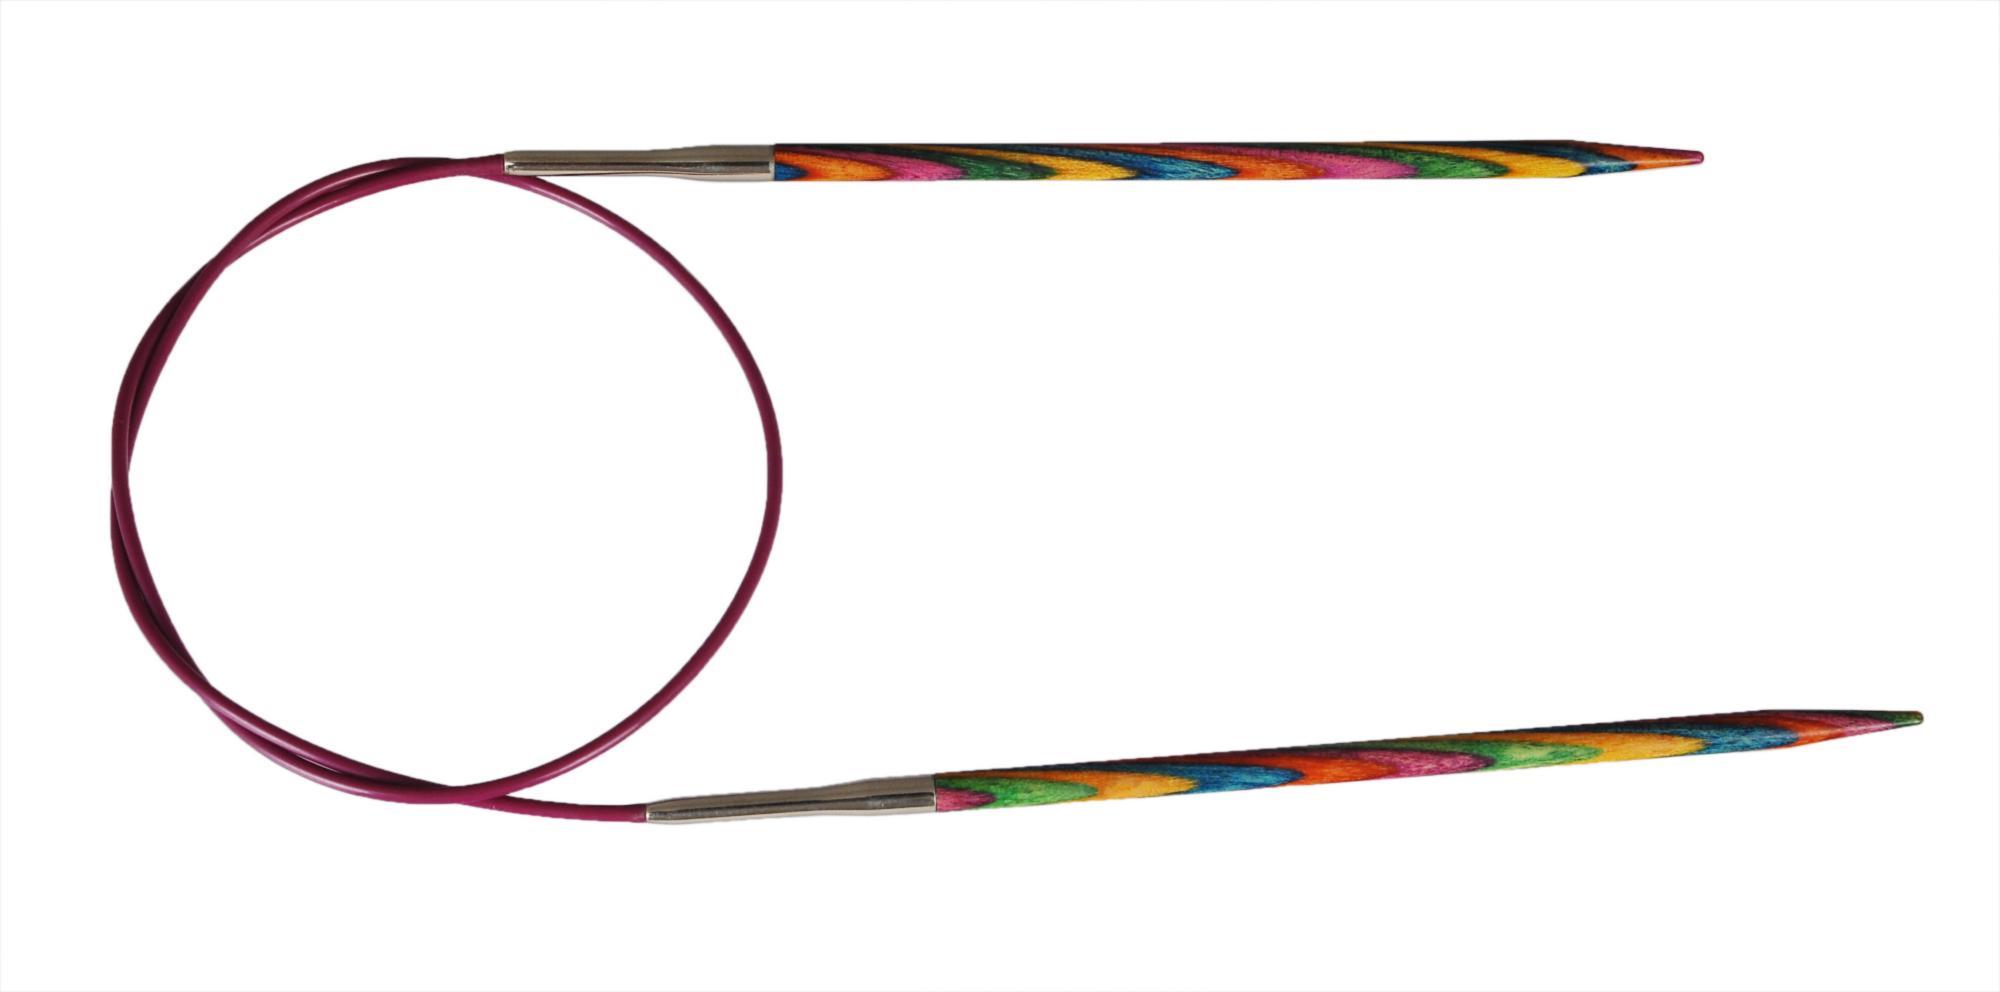 Спицы круговые 150 см Symfonie Wood KnitPro, 21382, 4.00 мм